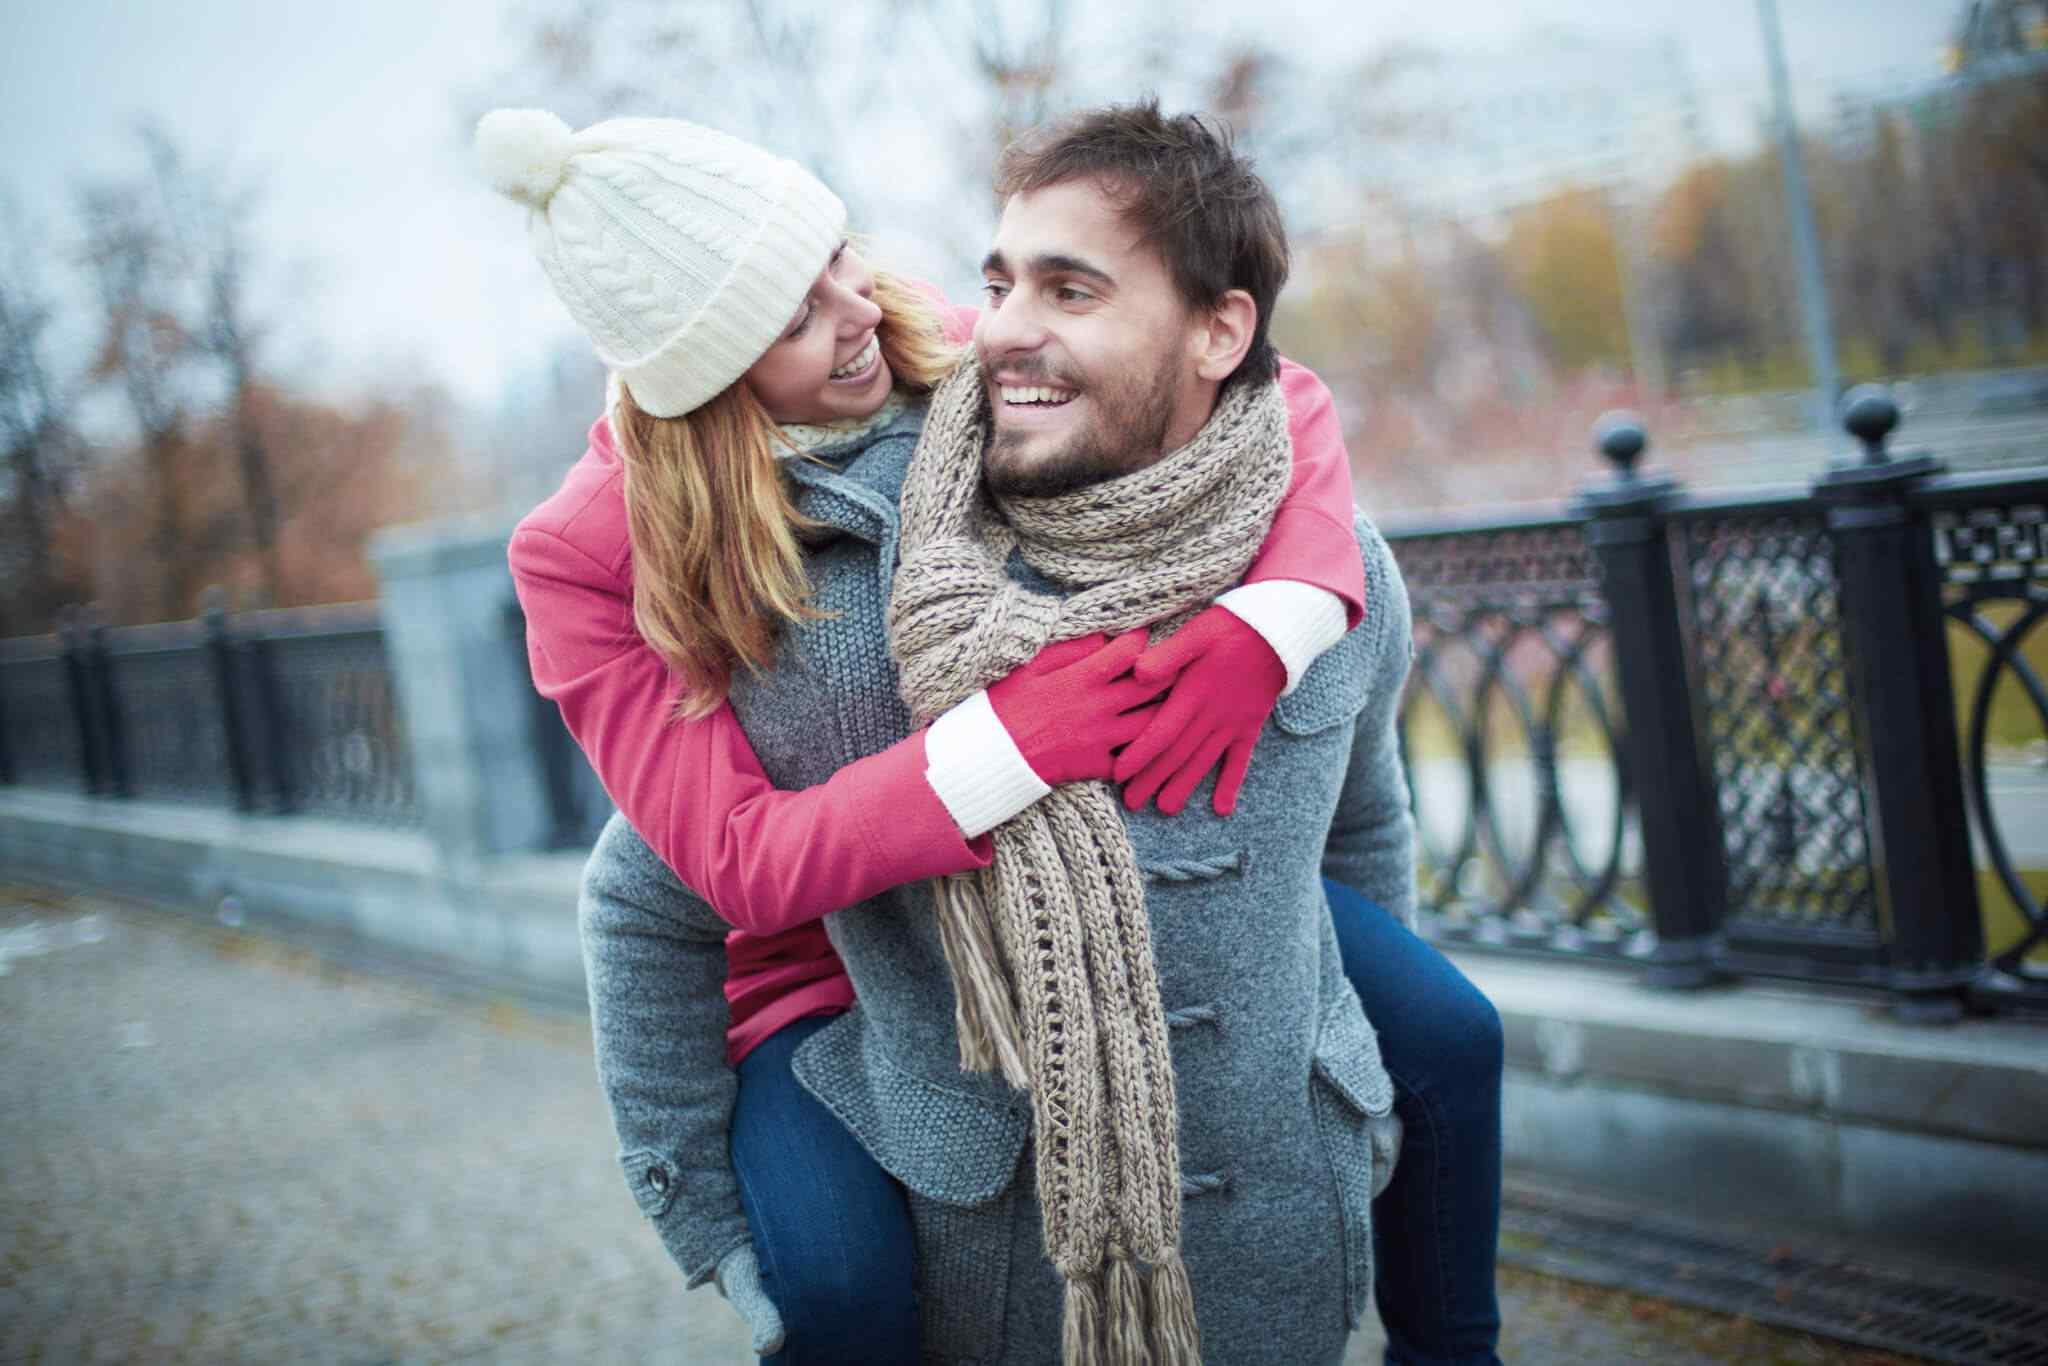 https://egoforall.com/wp-content/uploads/2018/01/img-event-marriage-01.jpg